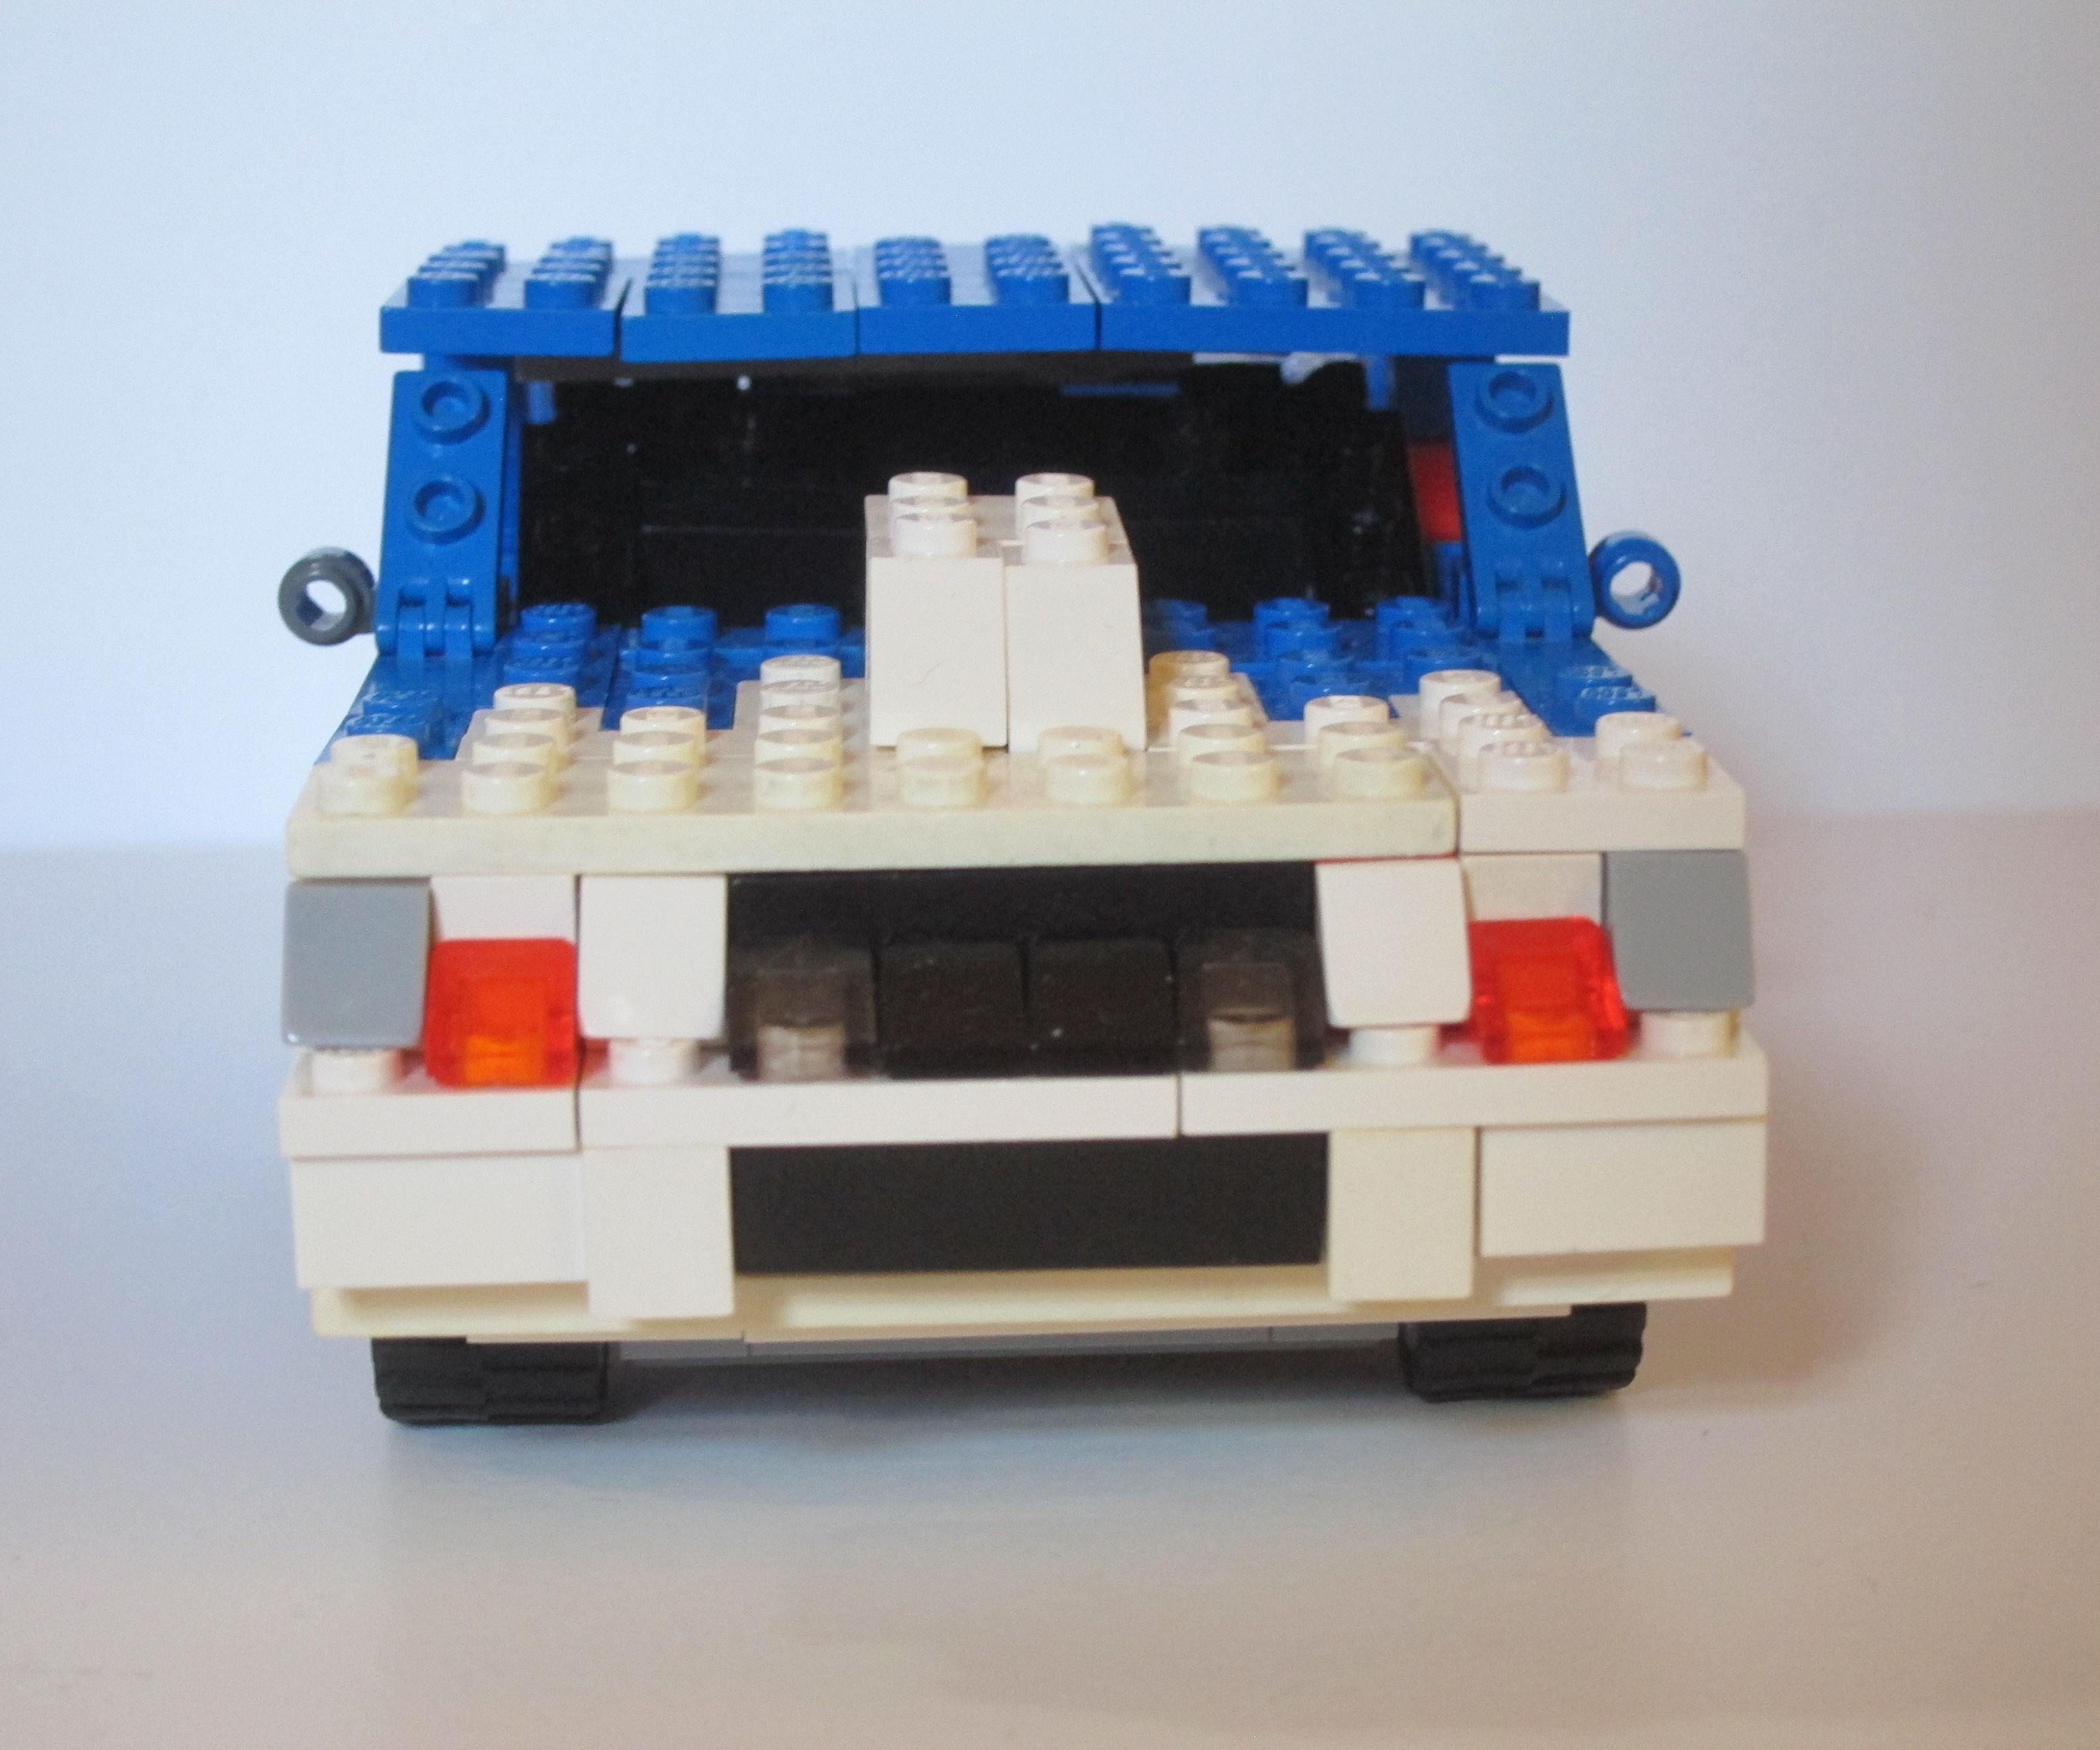 Lego Motorized Second Gen Chevrolet Camaro